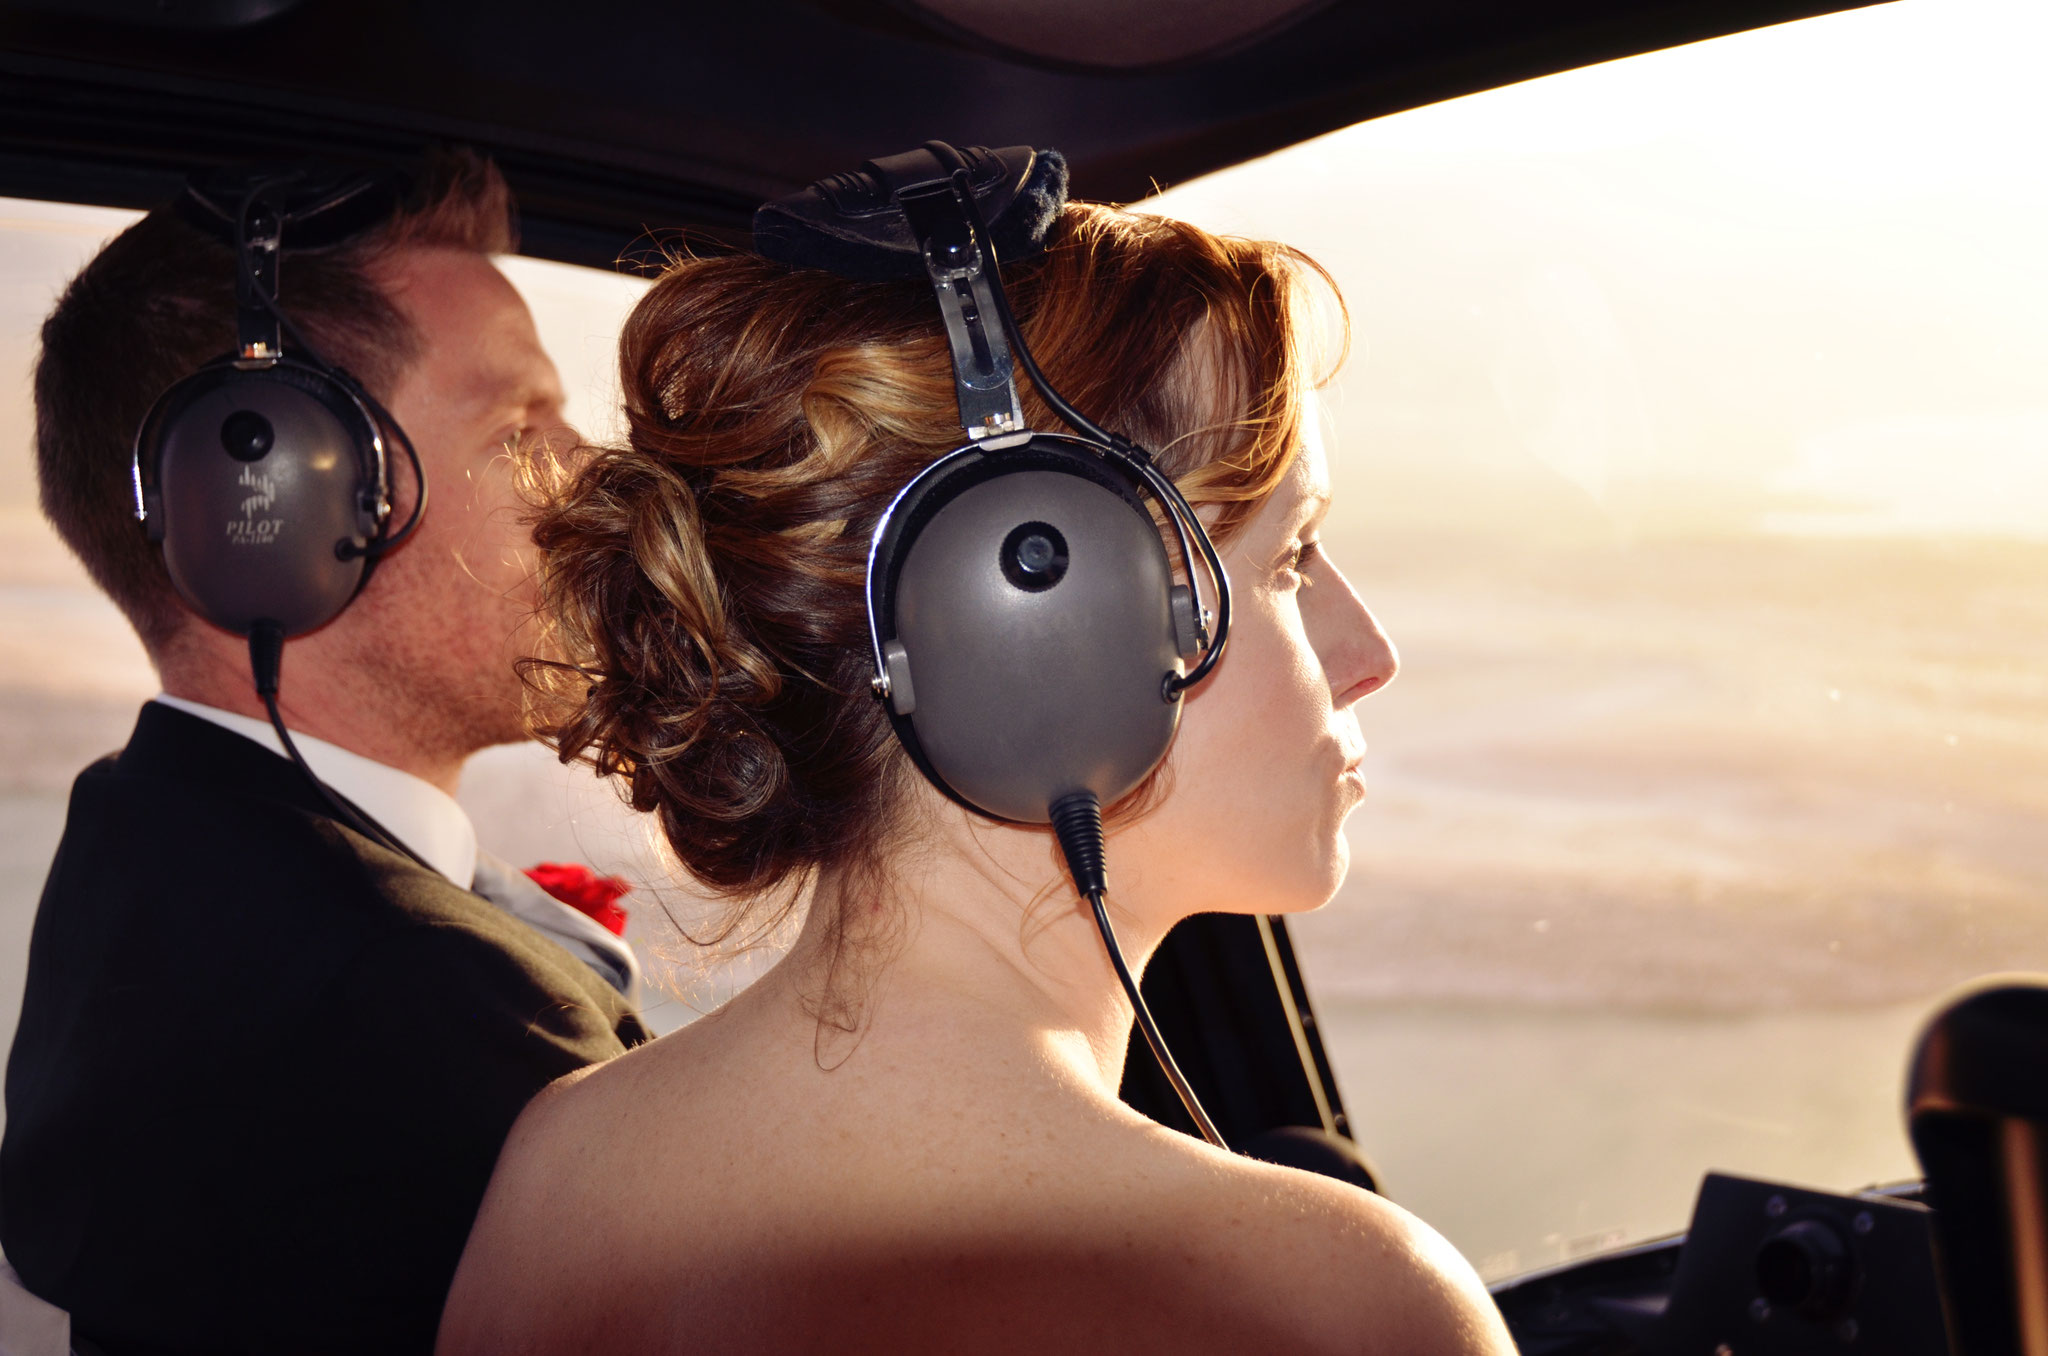 Brautpaar auf dem Flug zum Grand Canyon